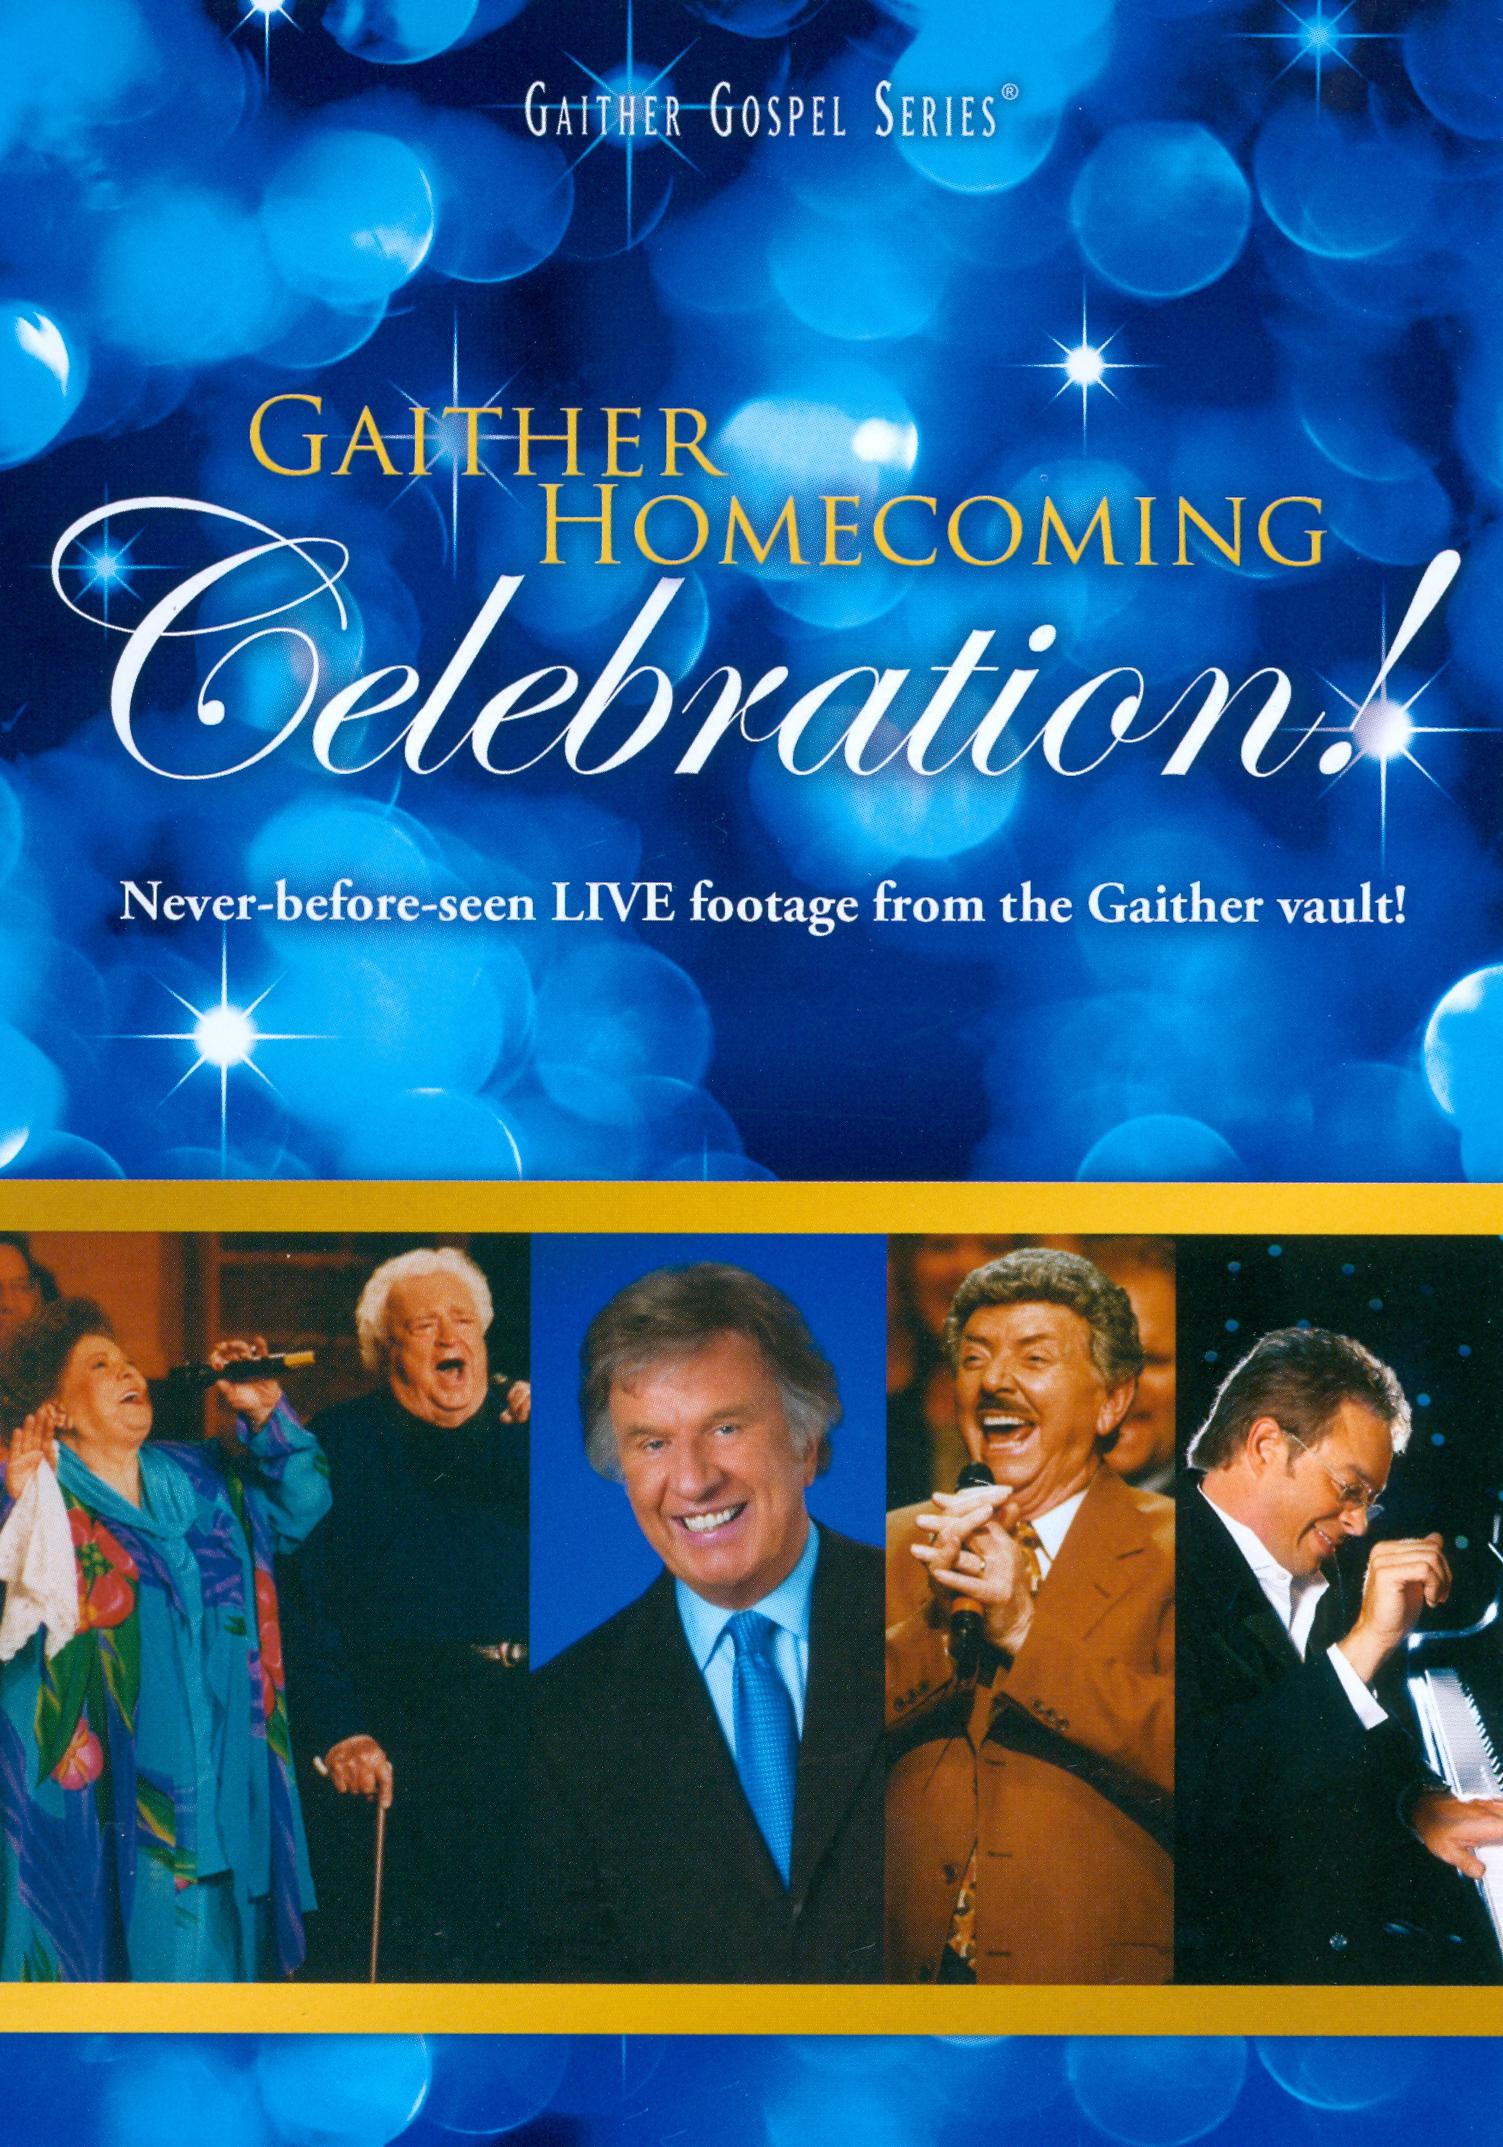 Gaither Gospel Series: Gaither Homecoming Celebration!